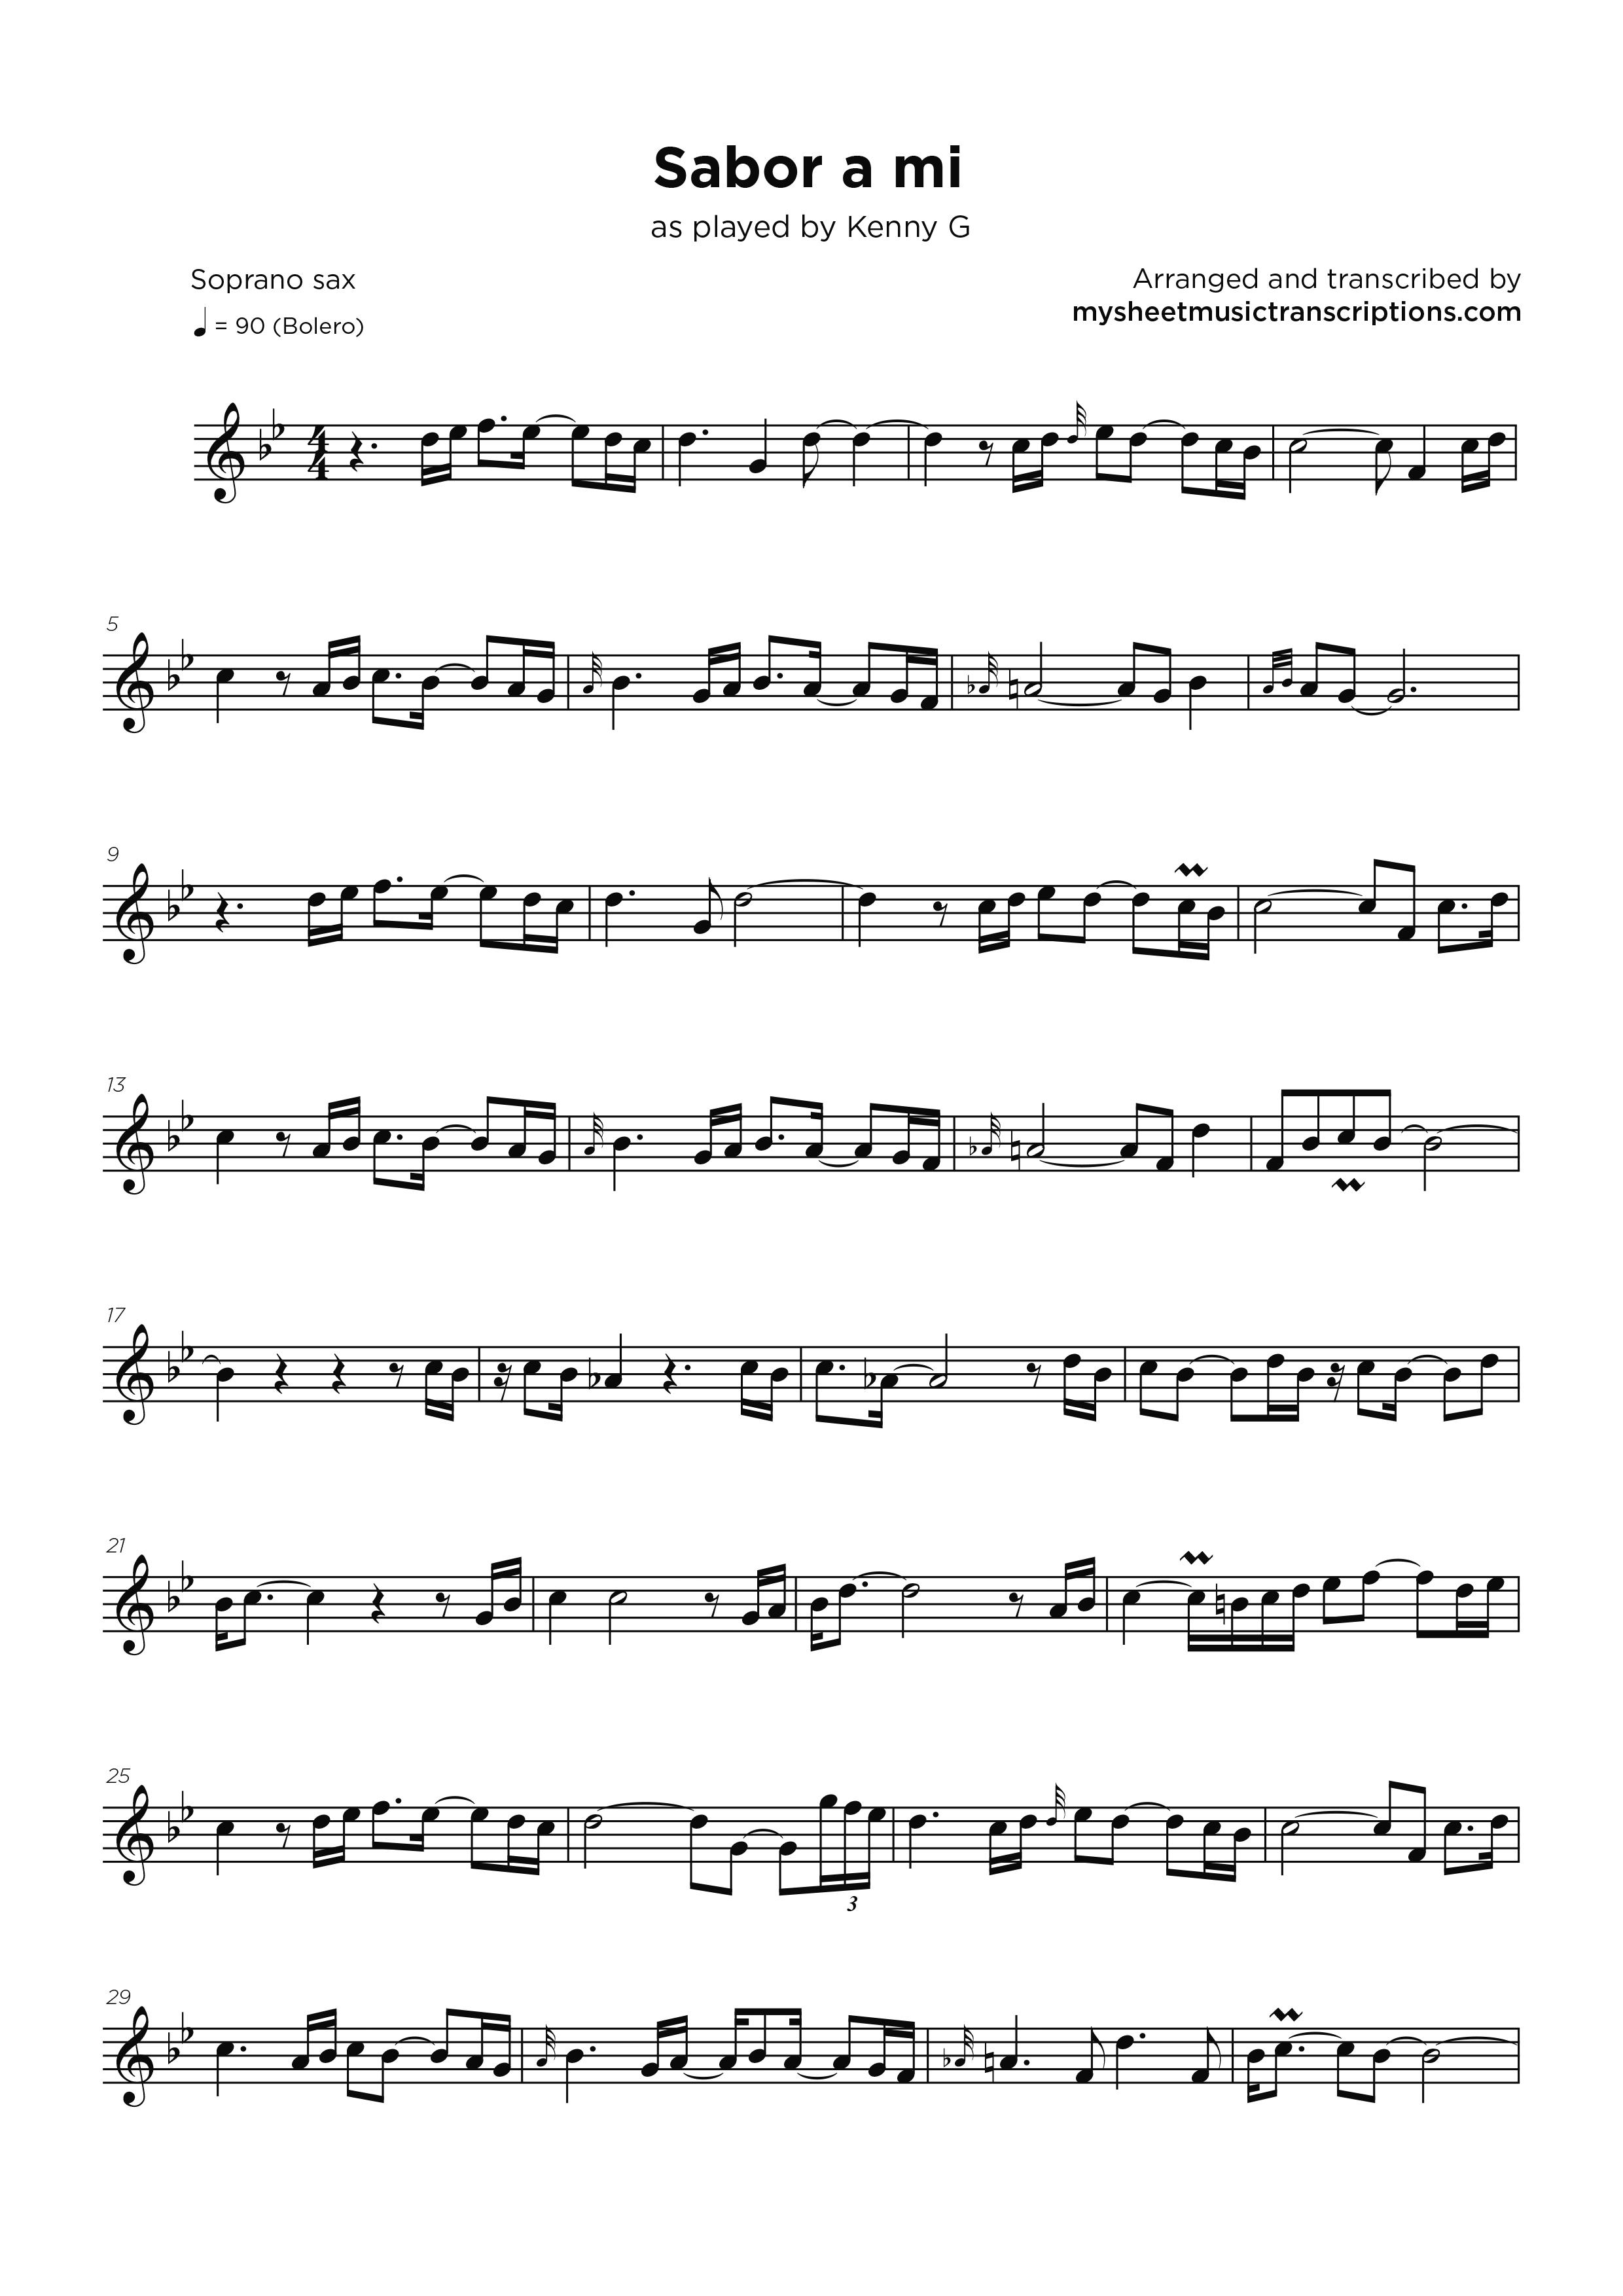 Sabor a mi - Kenny G - My Sheet Music Transcriptions